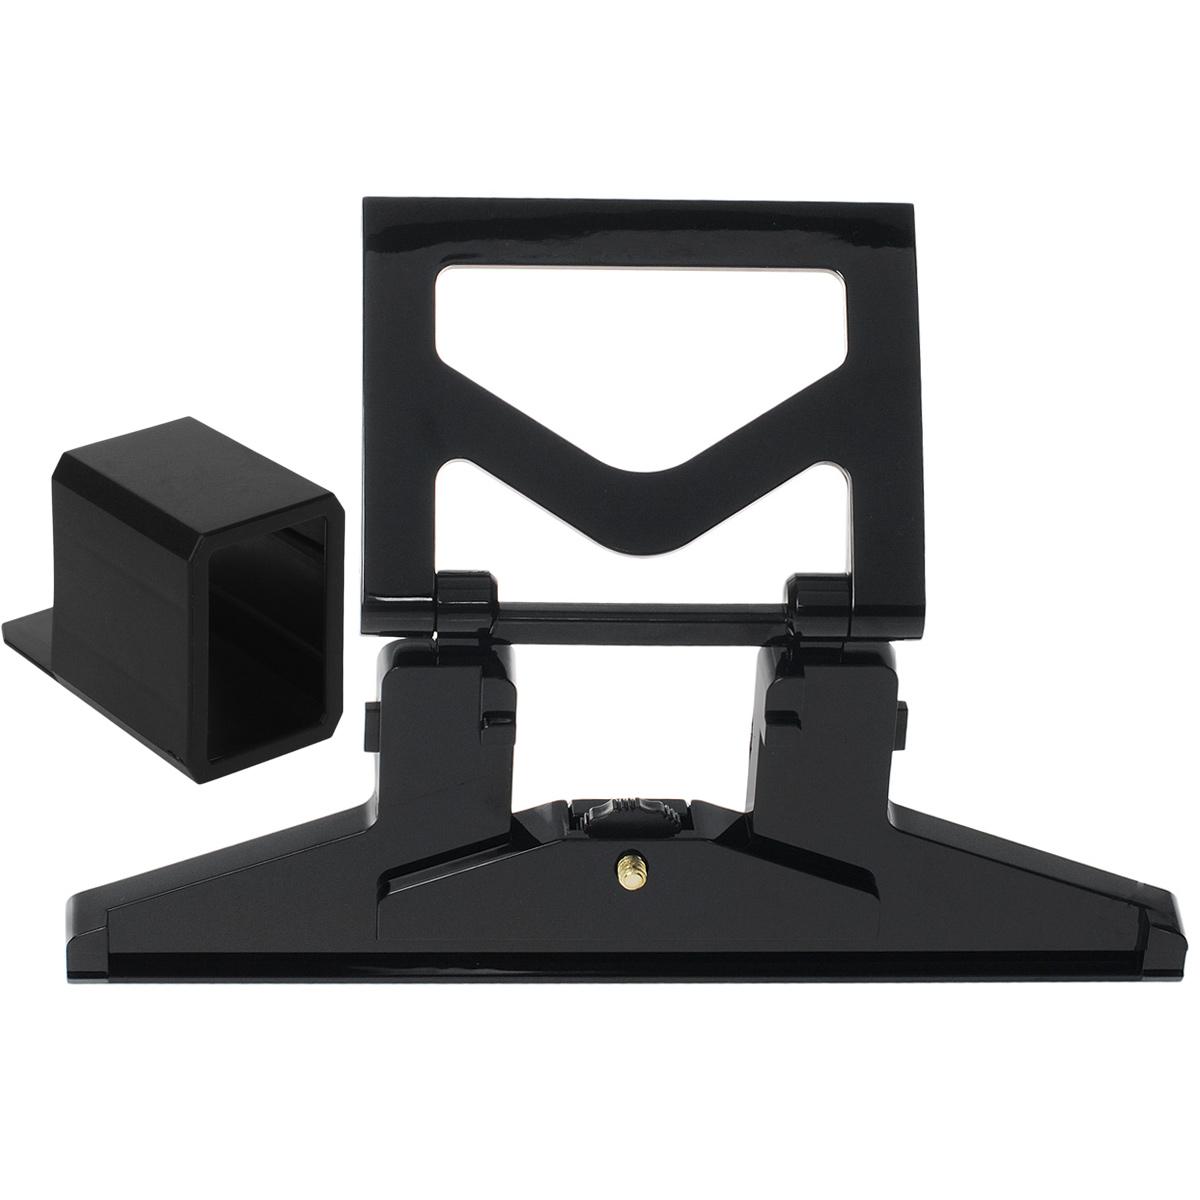 Крепление на телевизор Black Horns для Kinect Xbox One - Аксессуары